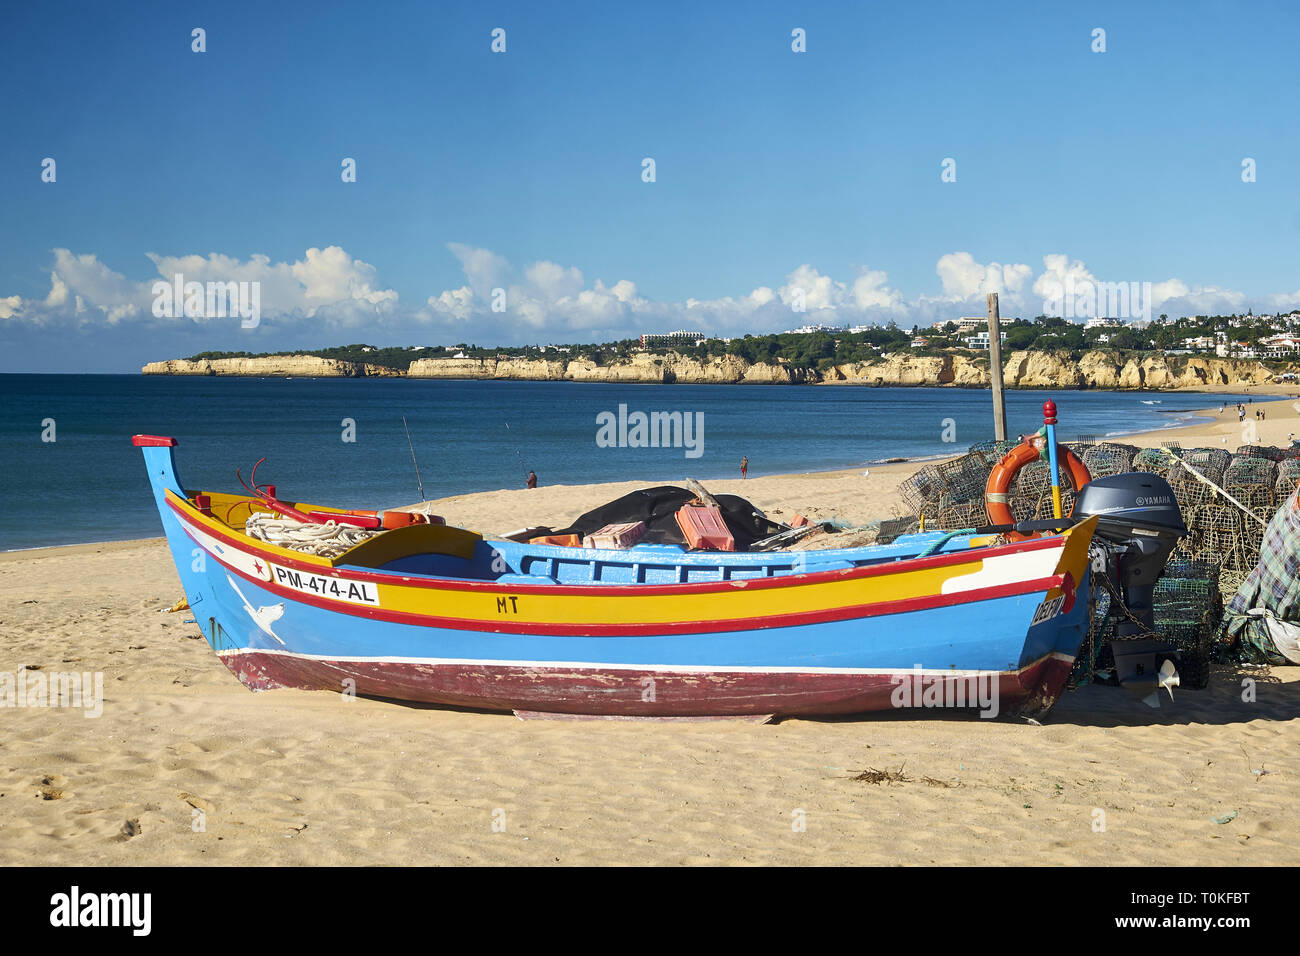 Fishing boat in Armação de Pera, Faro, Portugal - Stock Image